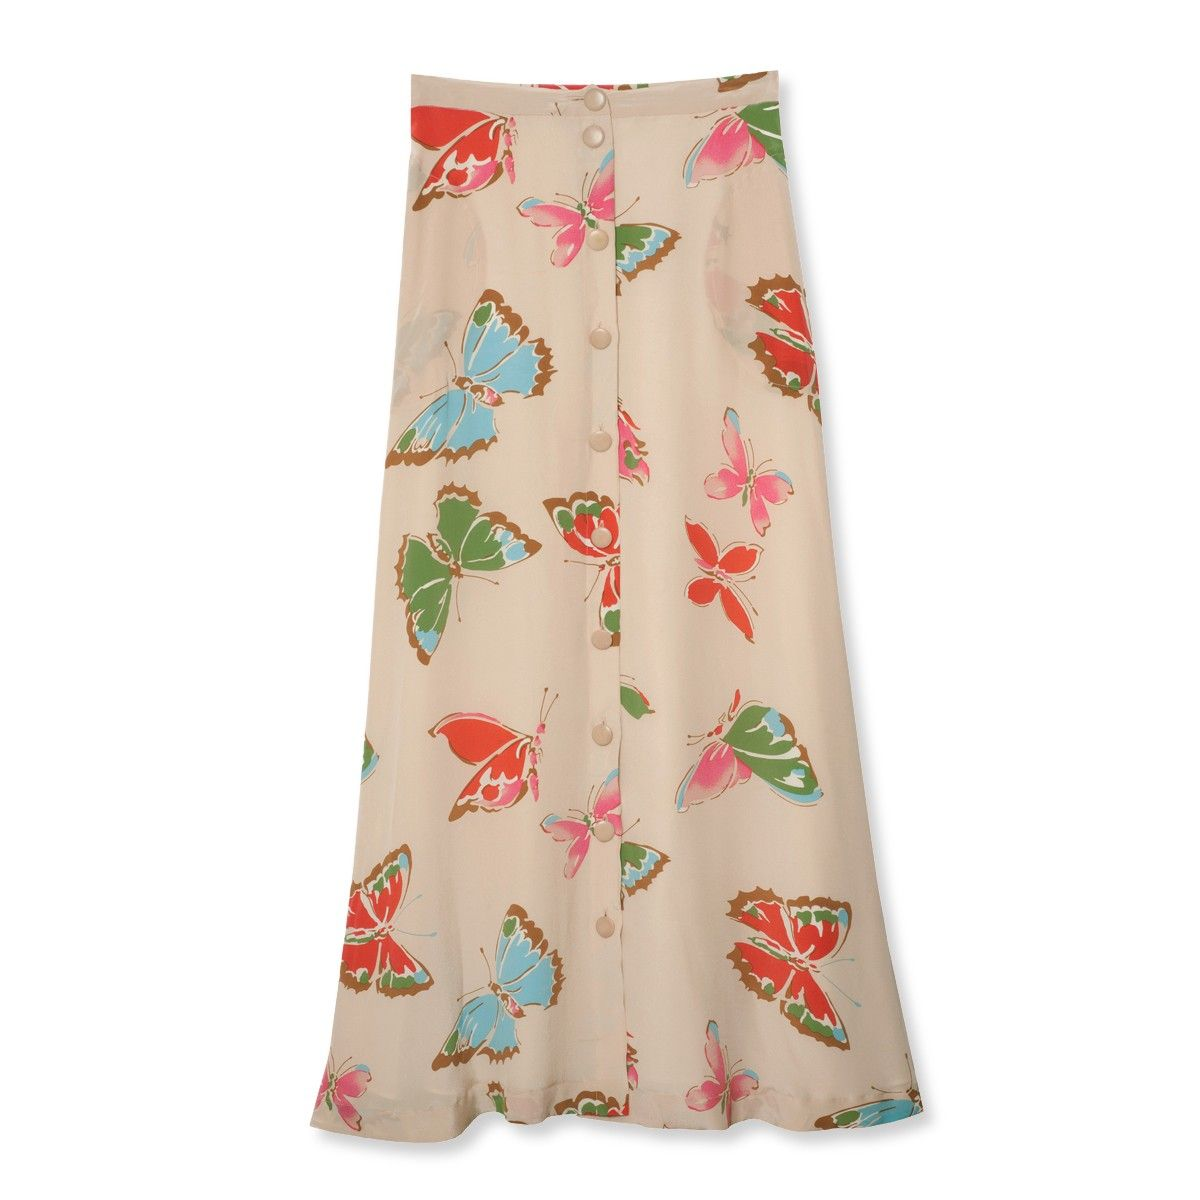 949297449013 Lolita Lempicka pour EKYOG, butterfly skirt   Ekyog   Pinterest   Jupes